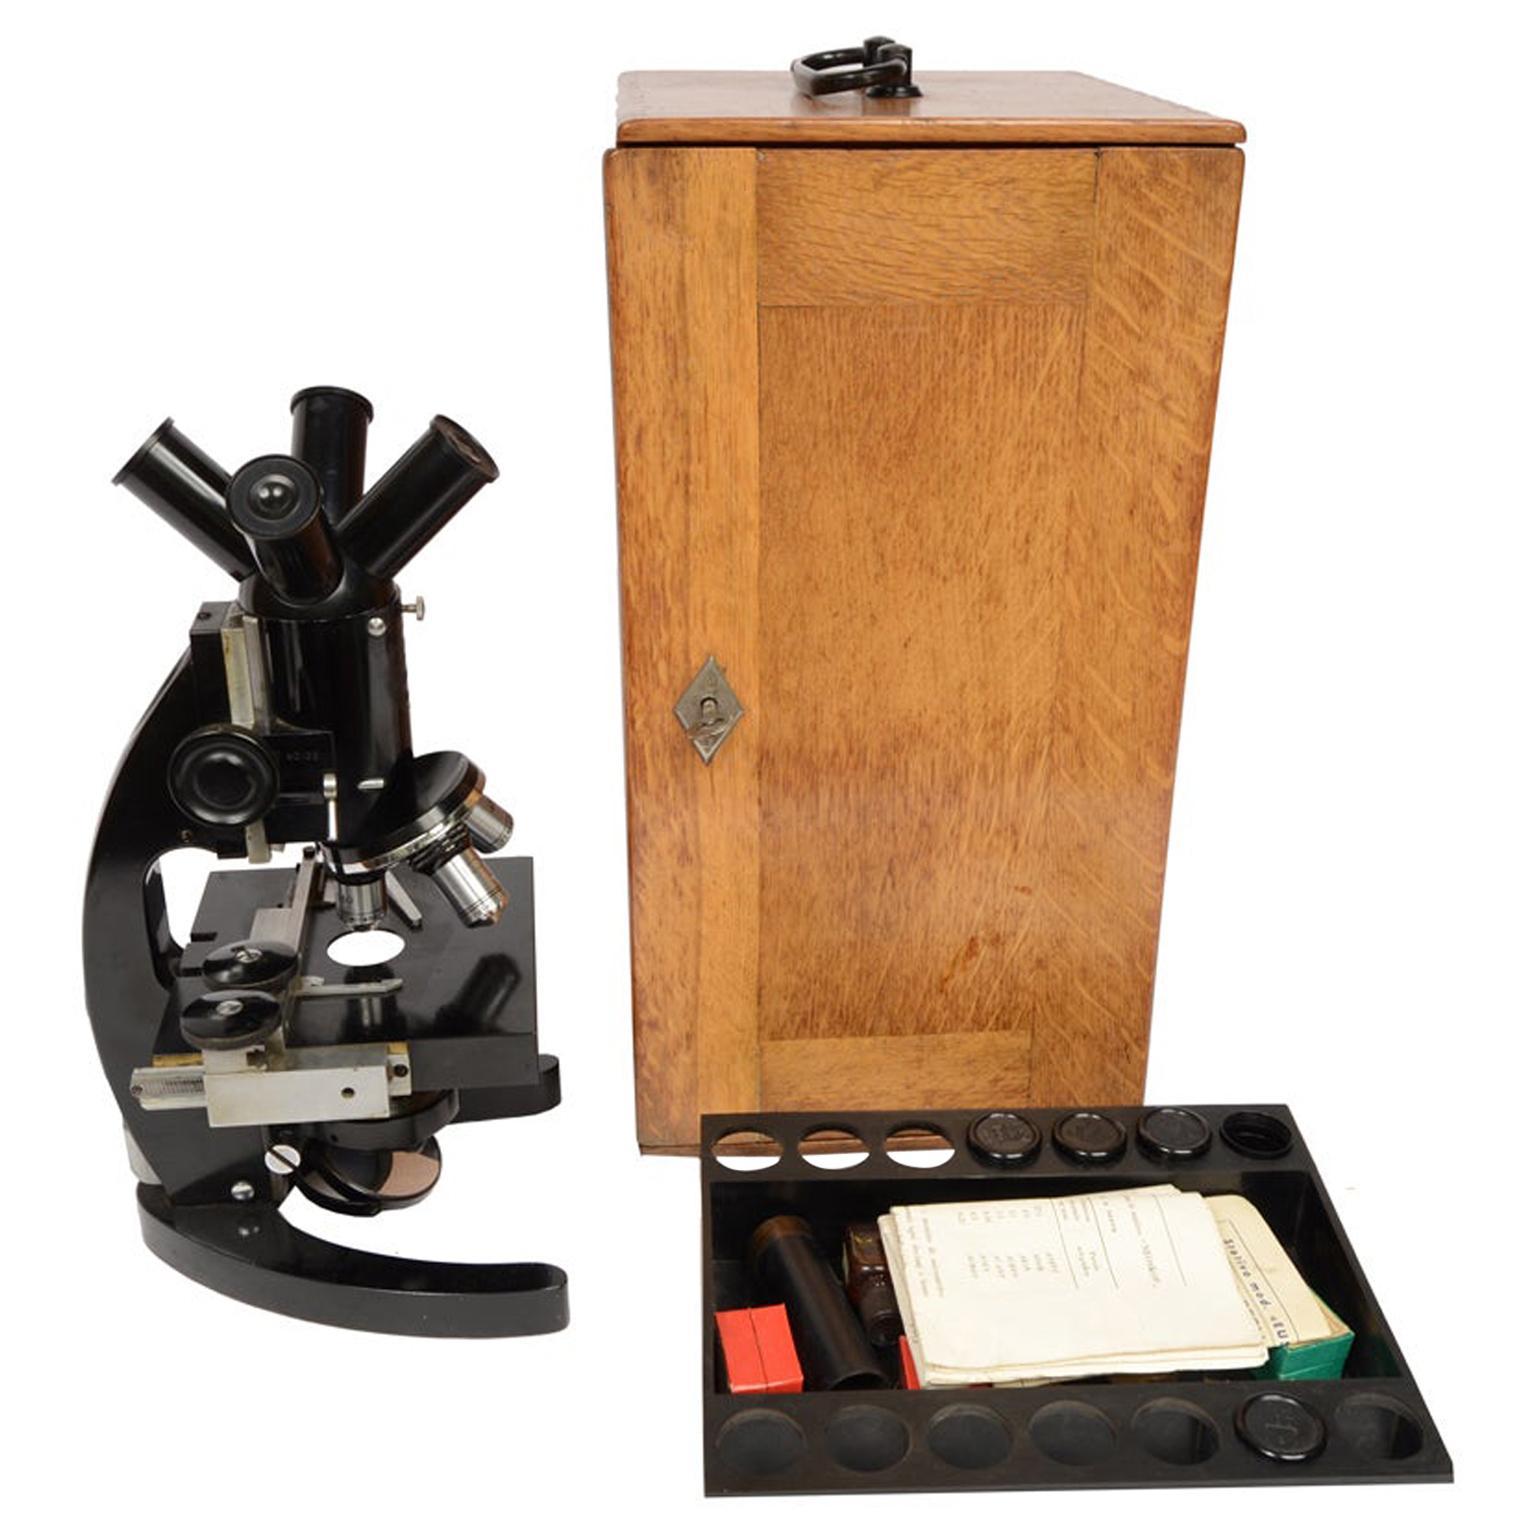 Milan 1910/20 F.lli Koristka Antique Microscope  Wooden Box with Accessories